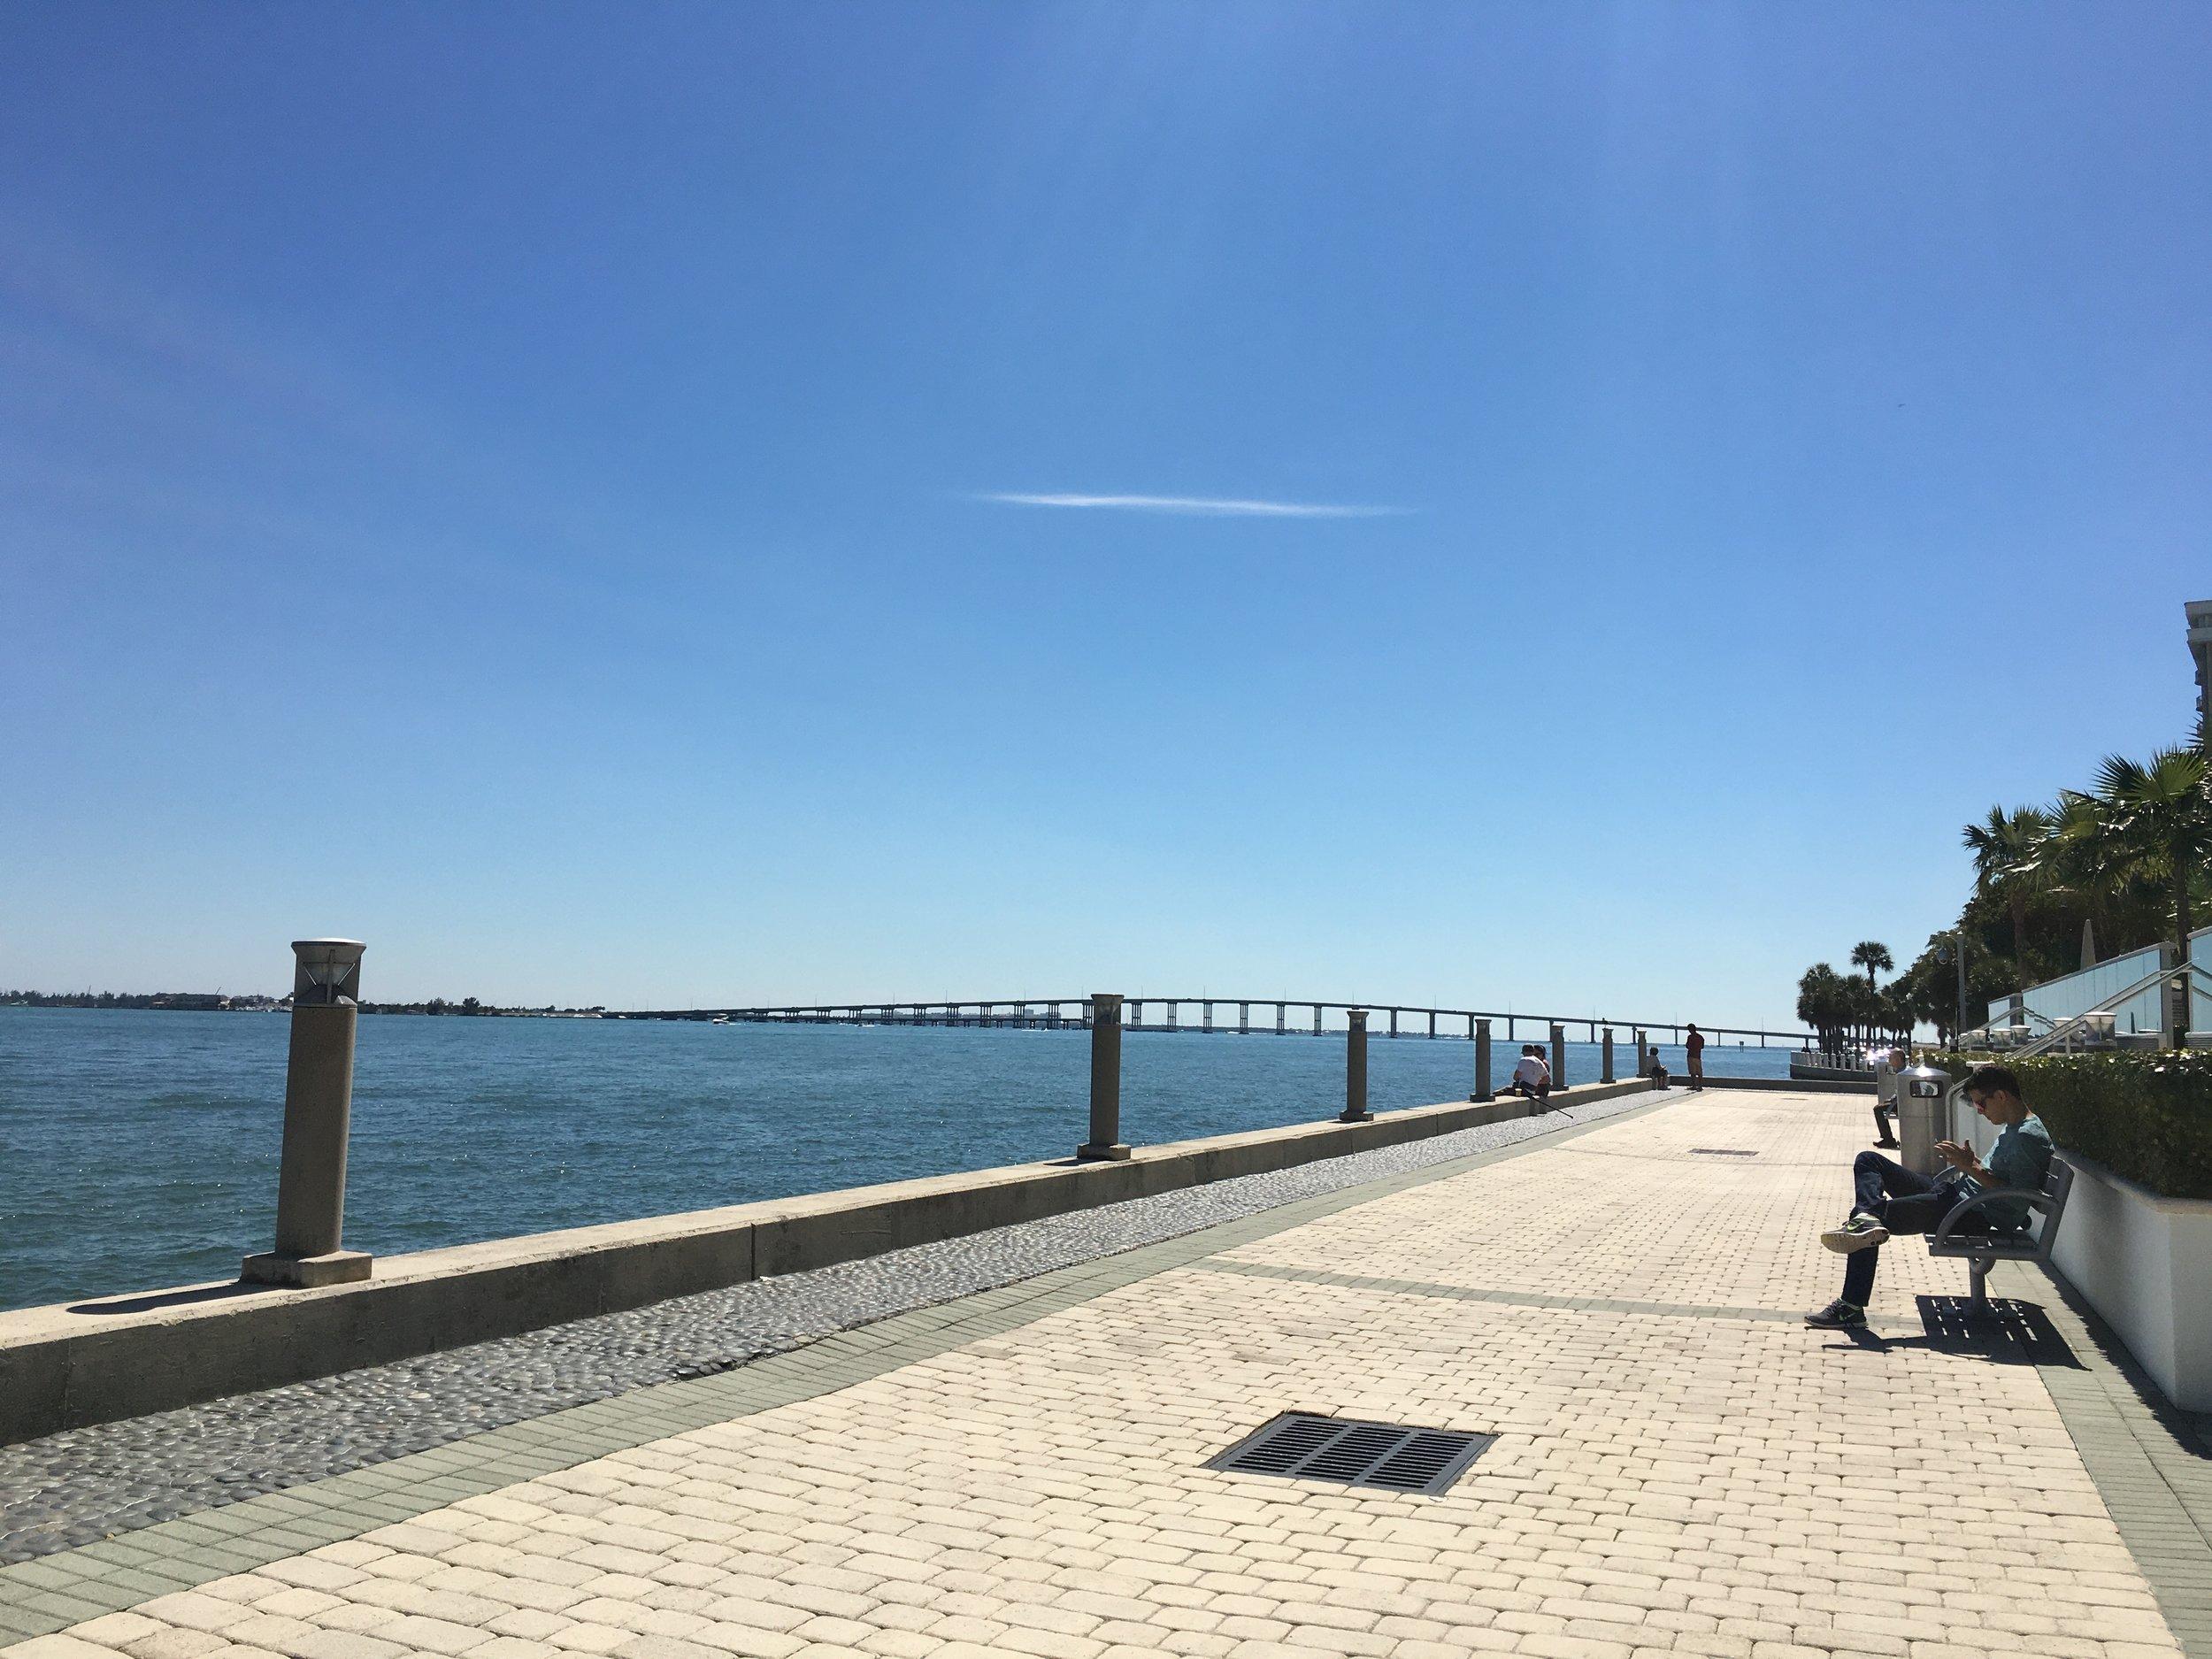 Brickell Bay